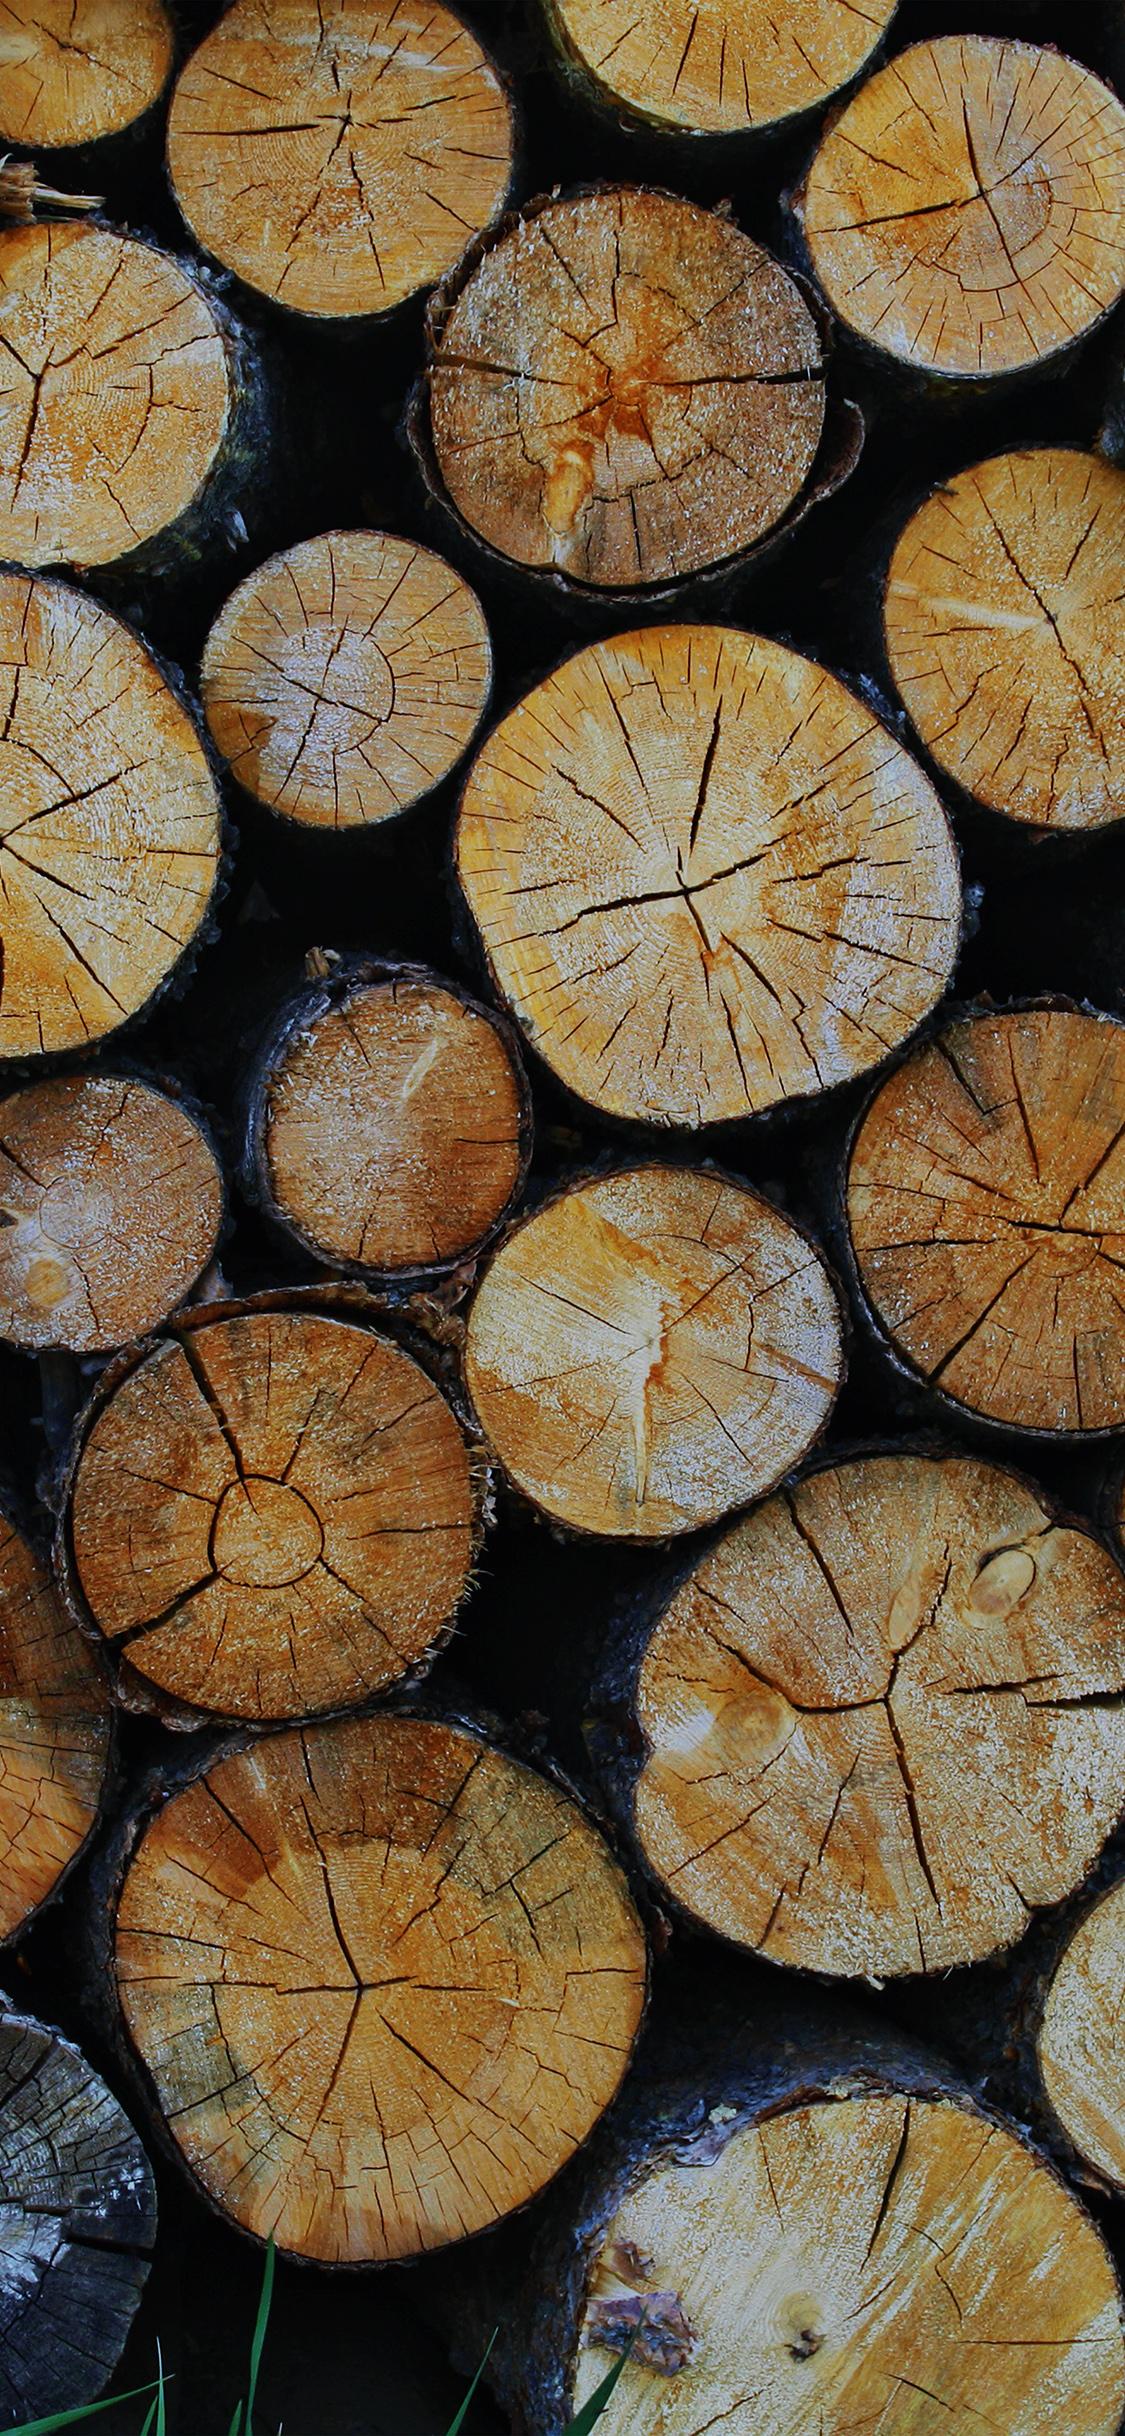 iPhonexpapers.com-Apple-iPhone-wallpaper-vr10-wood-nature-cut-pattern-dark